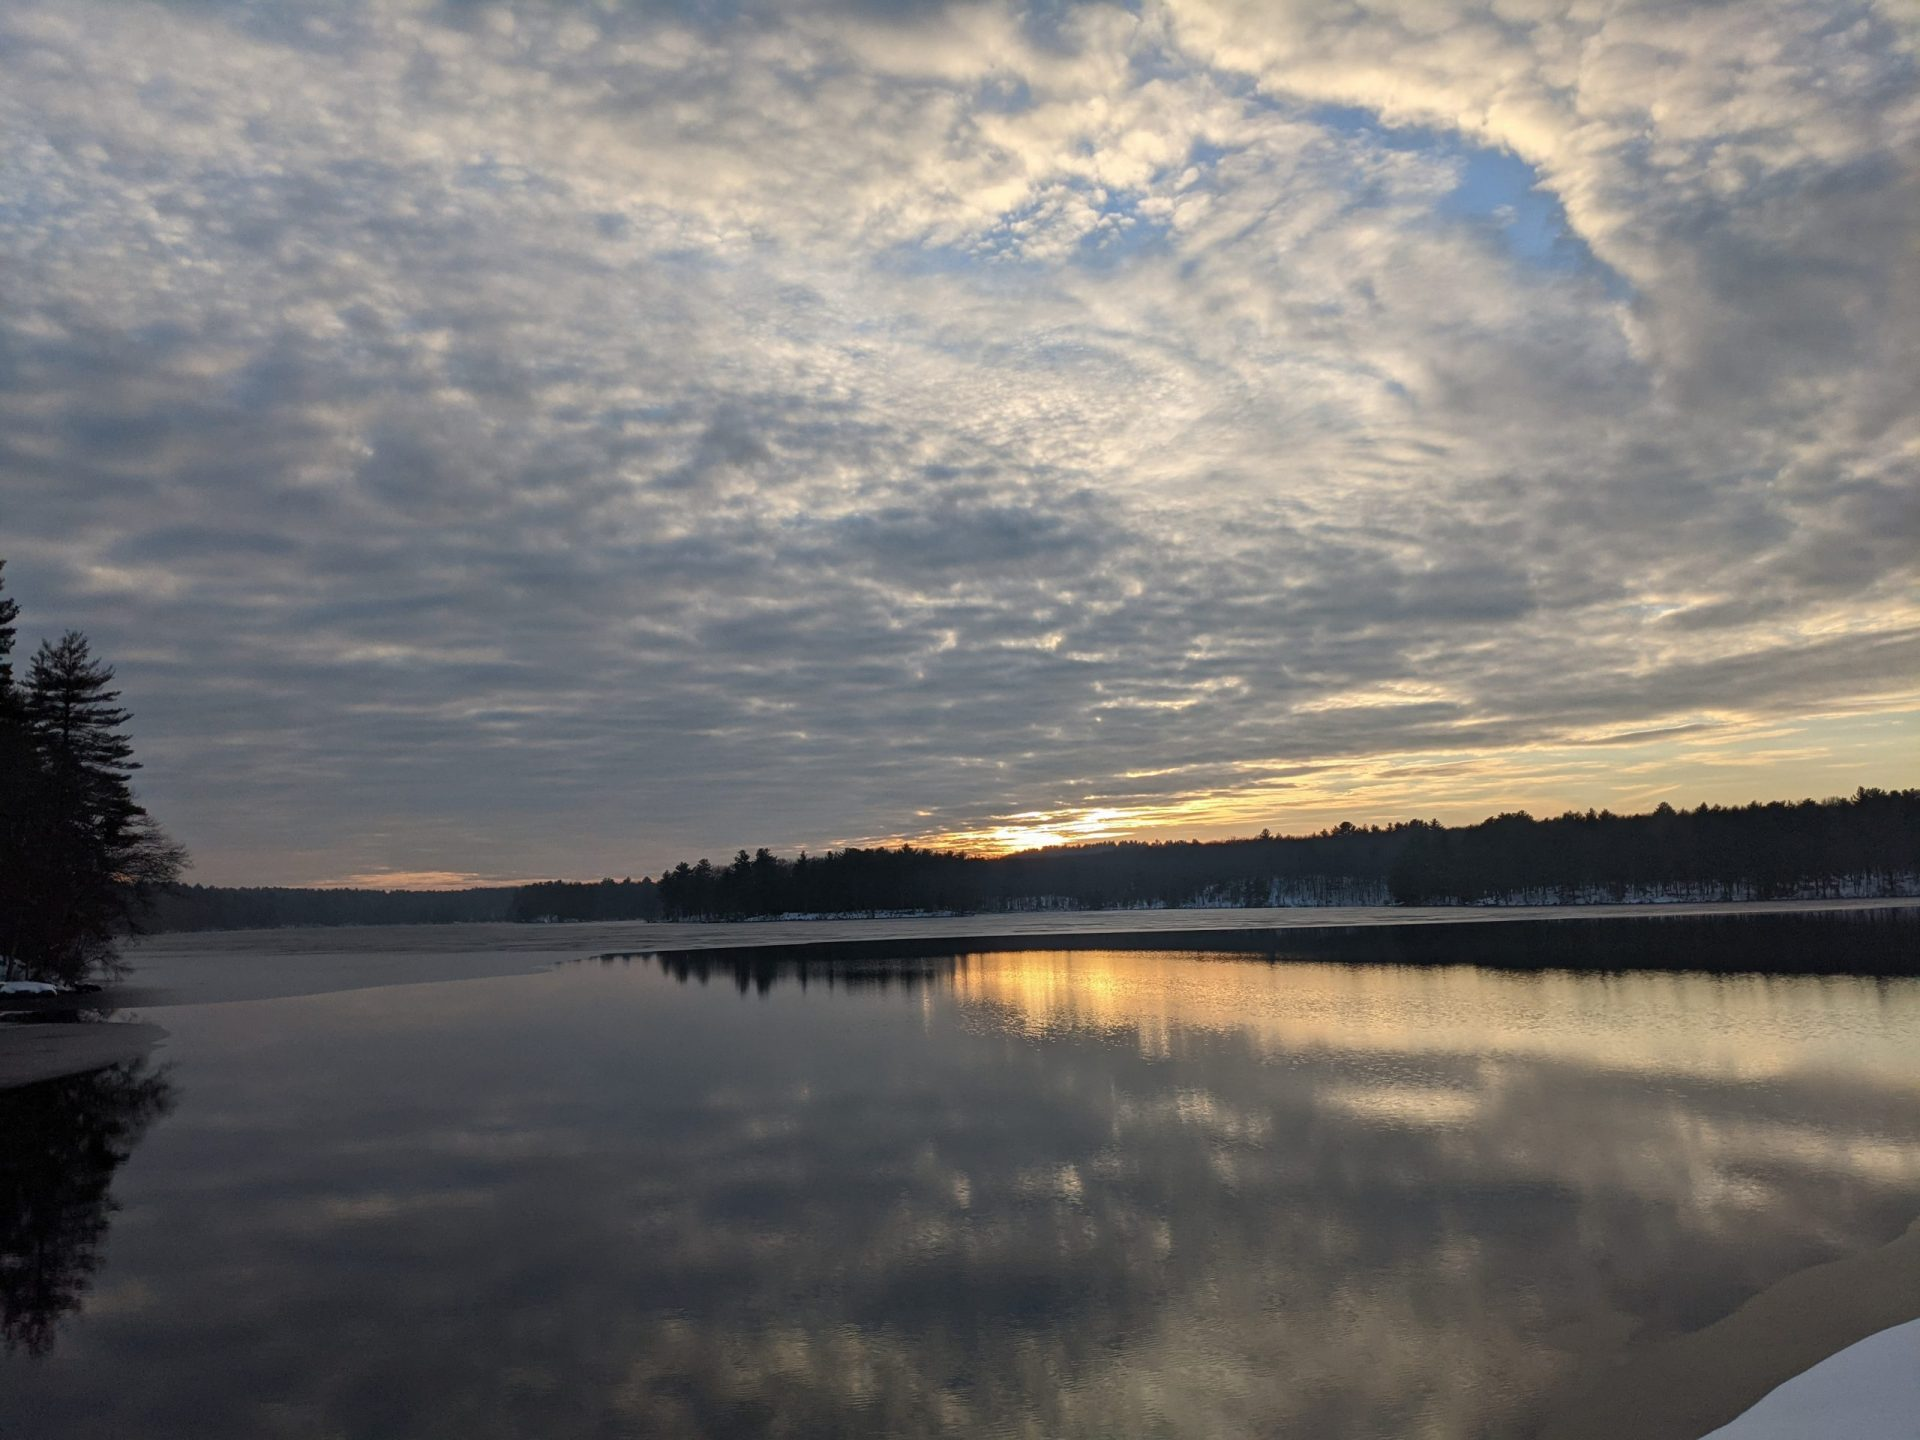 Late Sunset Cloud Covered Ashland Reservoir December 21, 2020